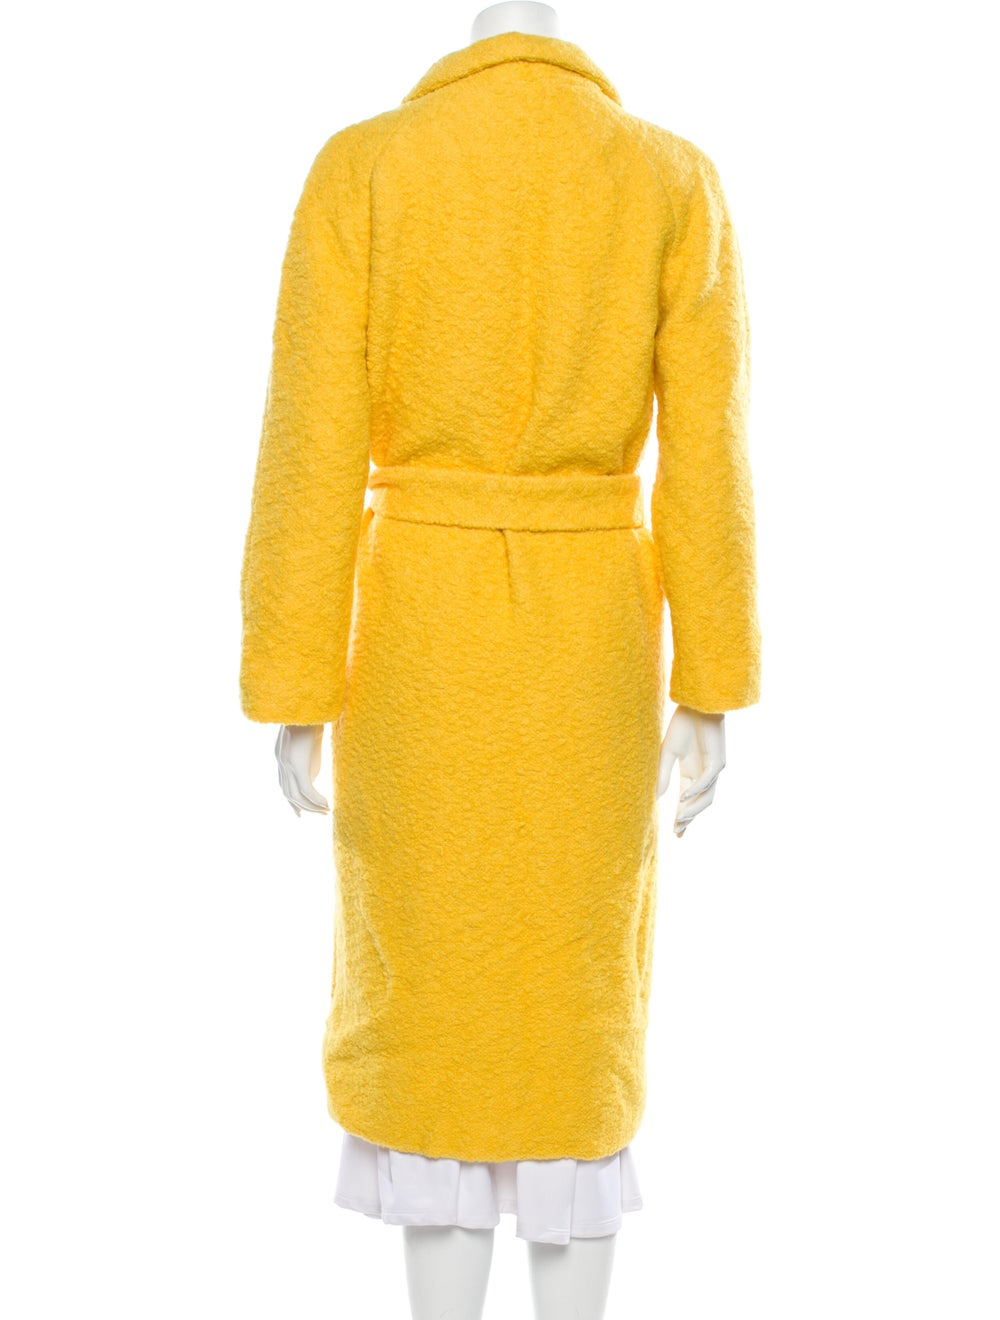 Ganni Faux Fur Coat Yellow - image 3